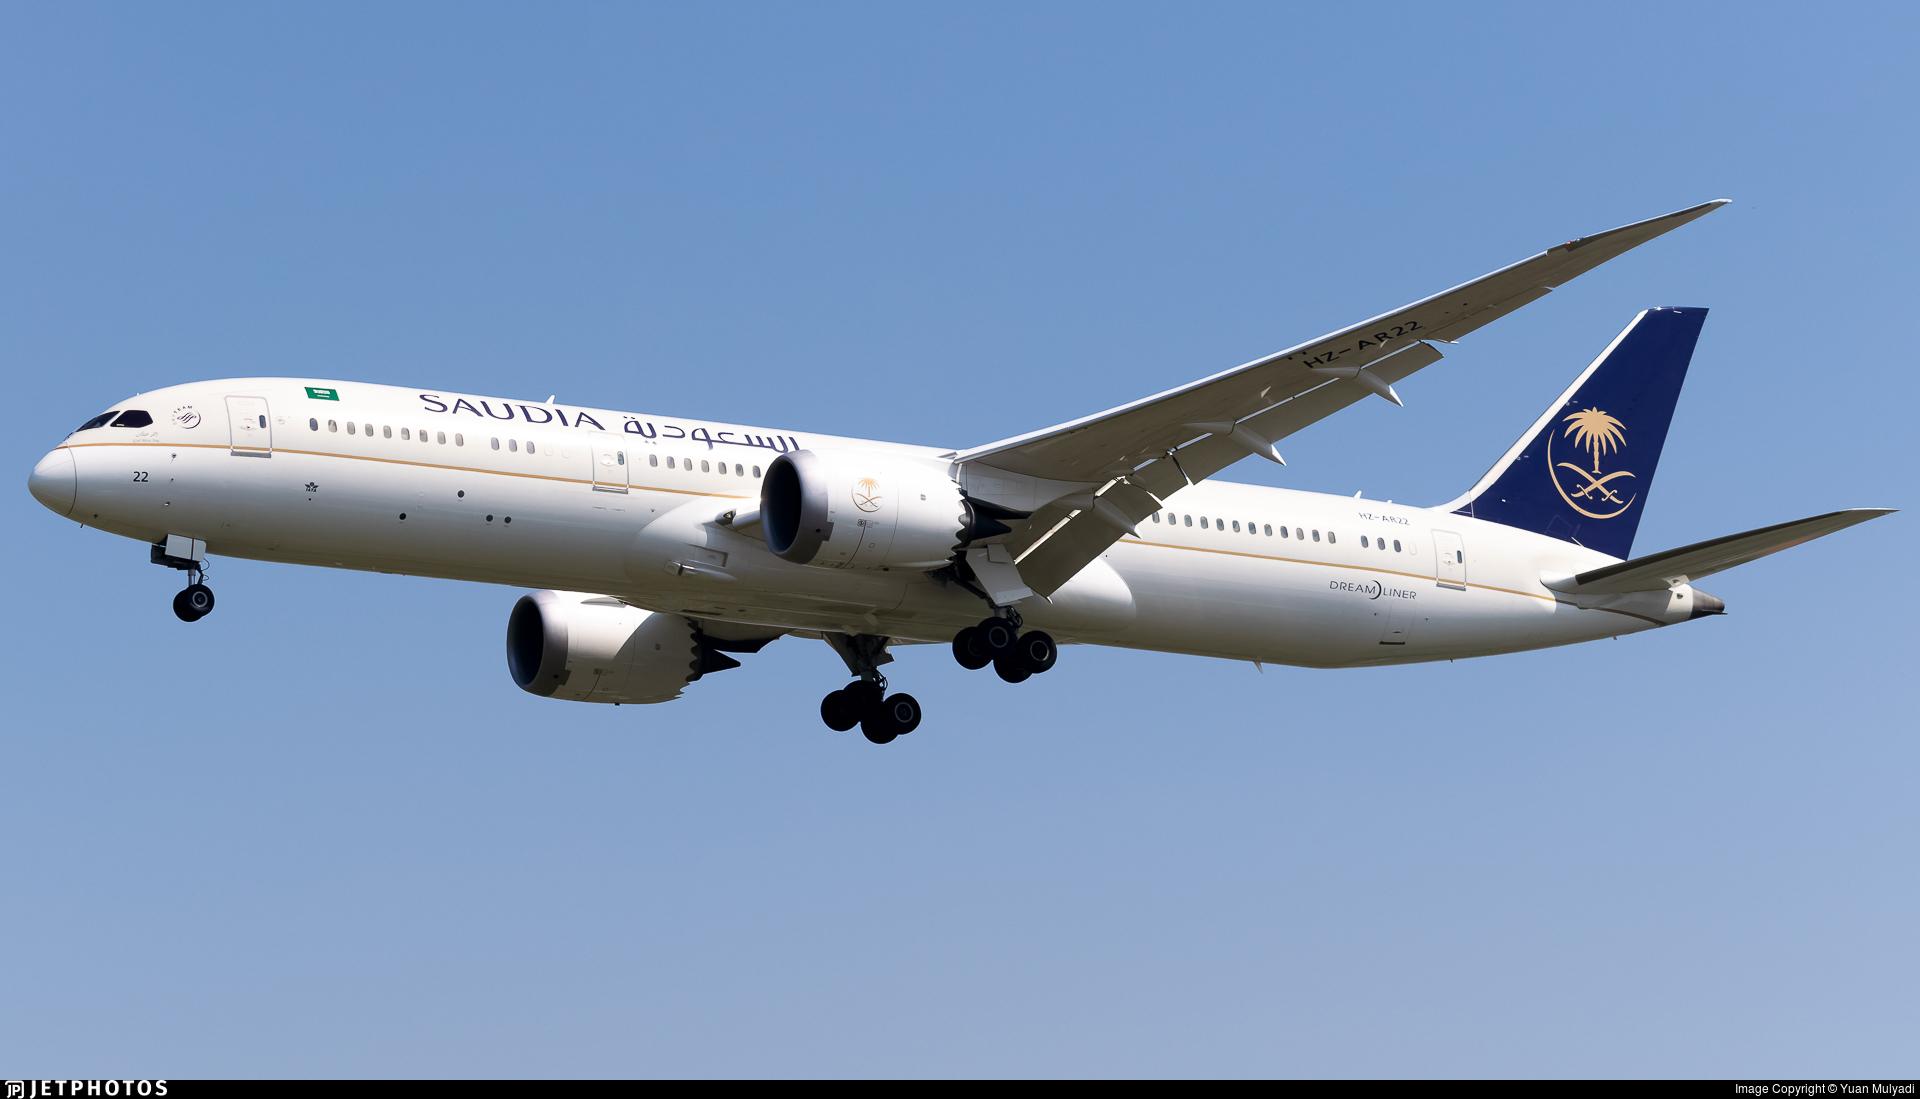 HZ-AR22 - Boeing 787-9 Dreamliner - Saudi Arabian Airlines